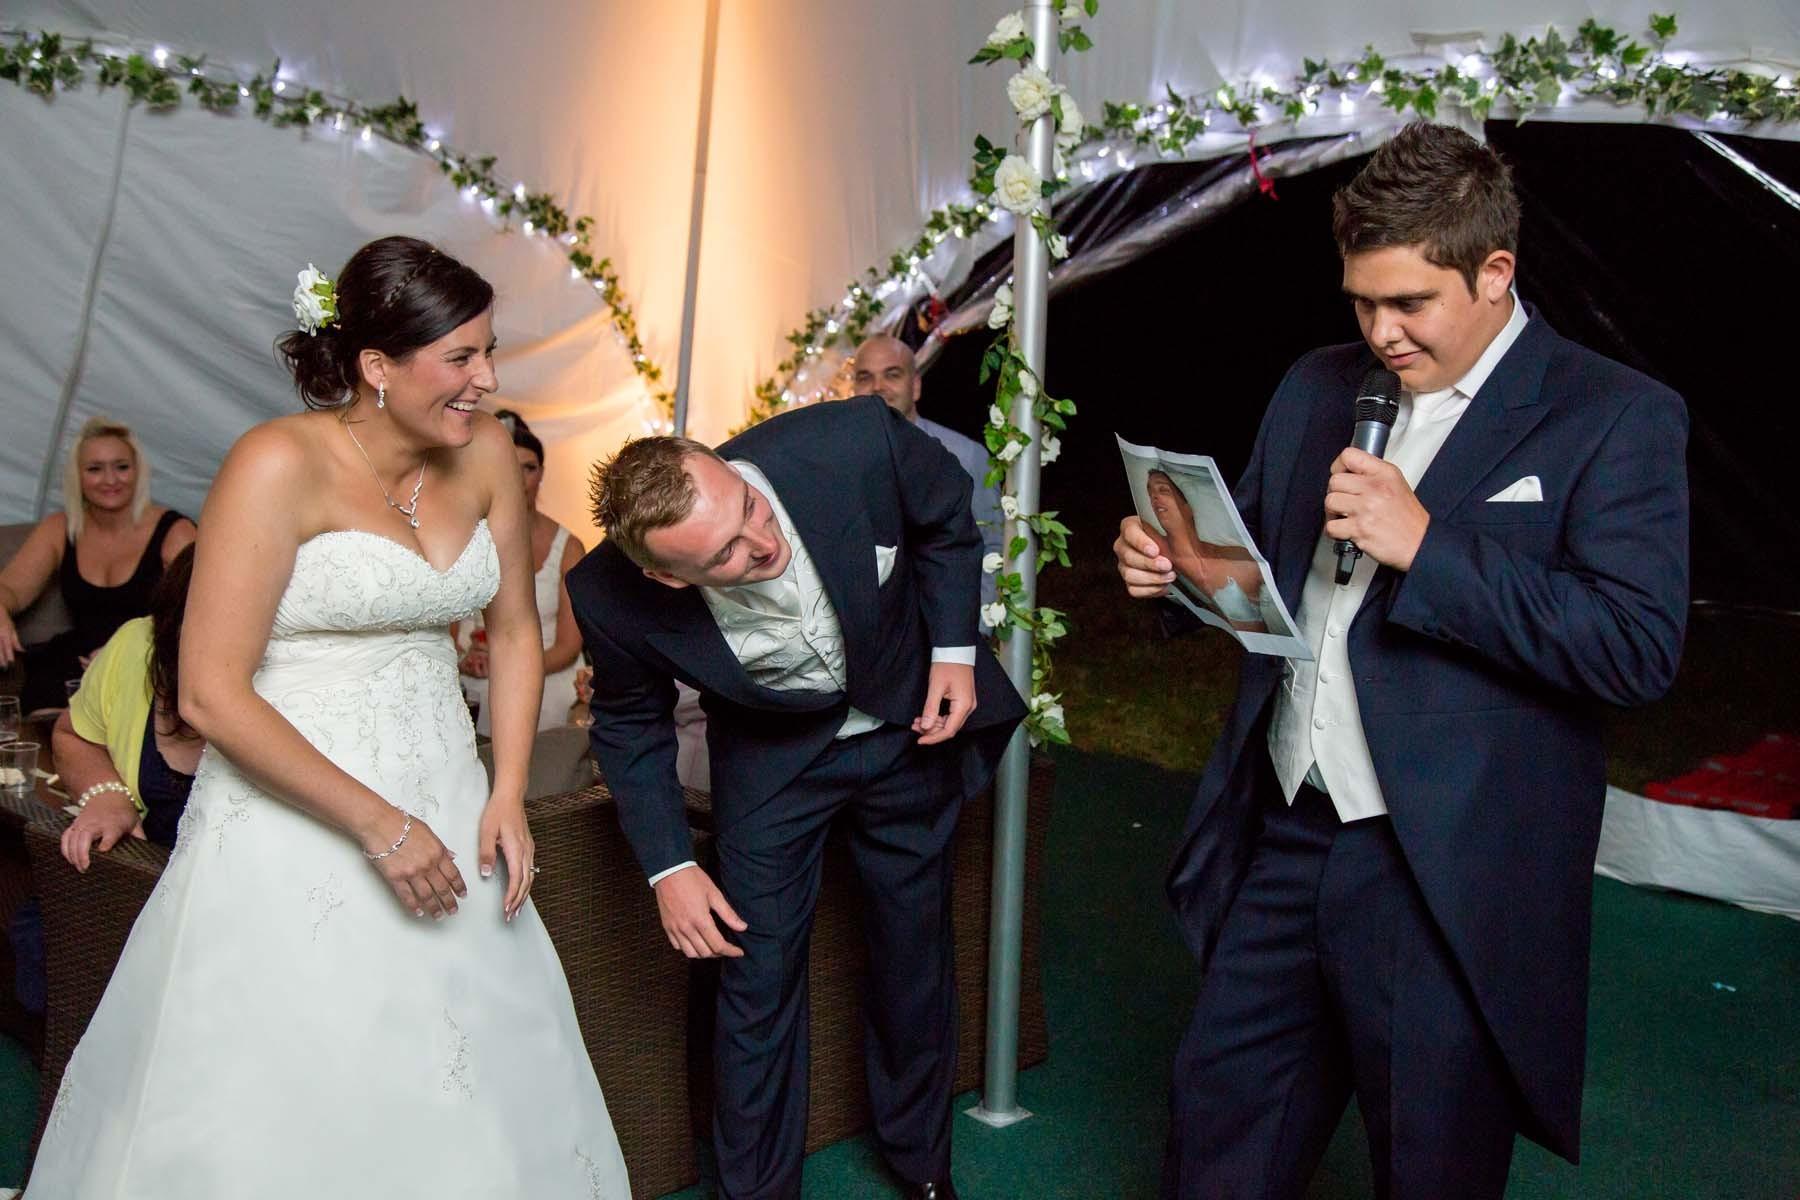 Sussex & Surrey Wedding Photographer - Guests & Groups (26)